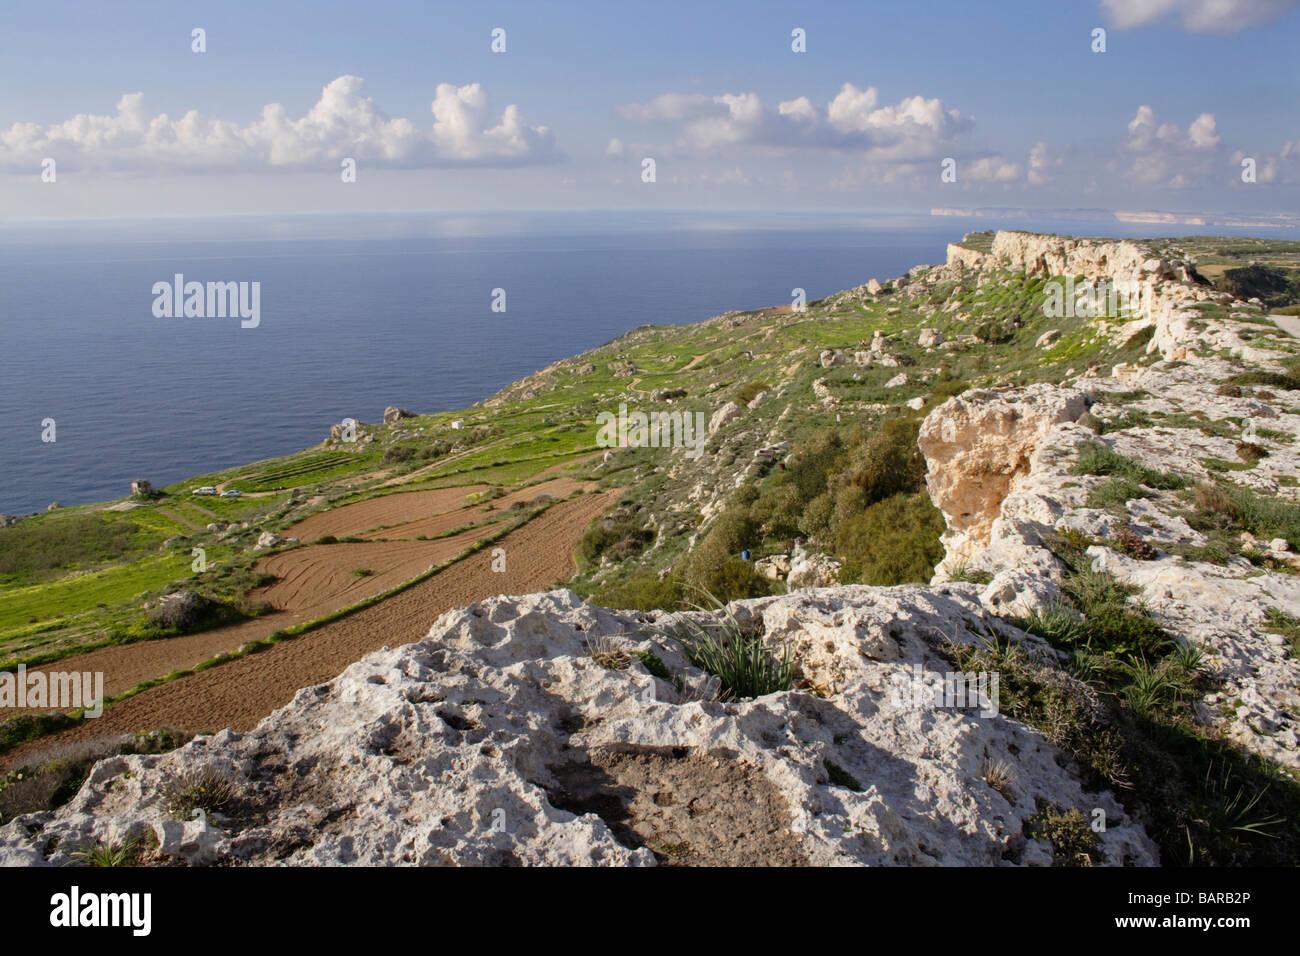 Limestone ridge on the north-west coast of Malta, a Mediterranean island in Europe - Stock Image